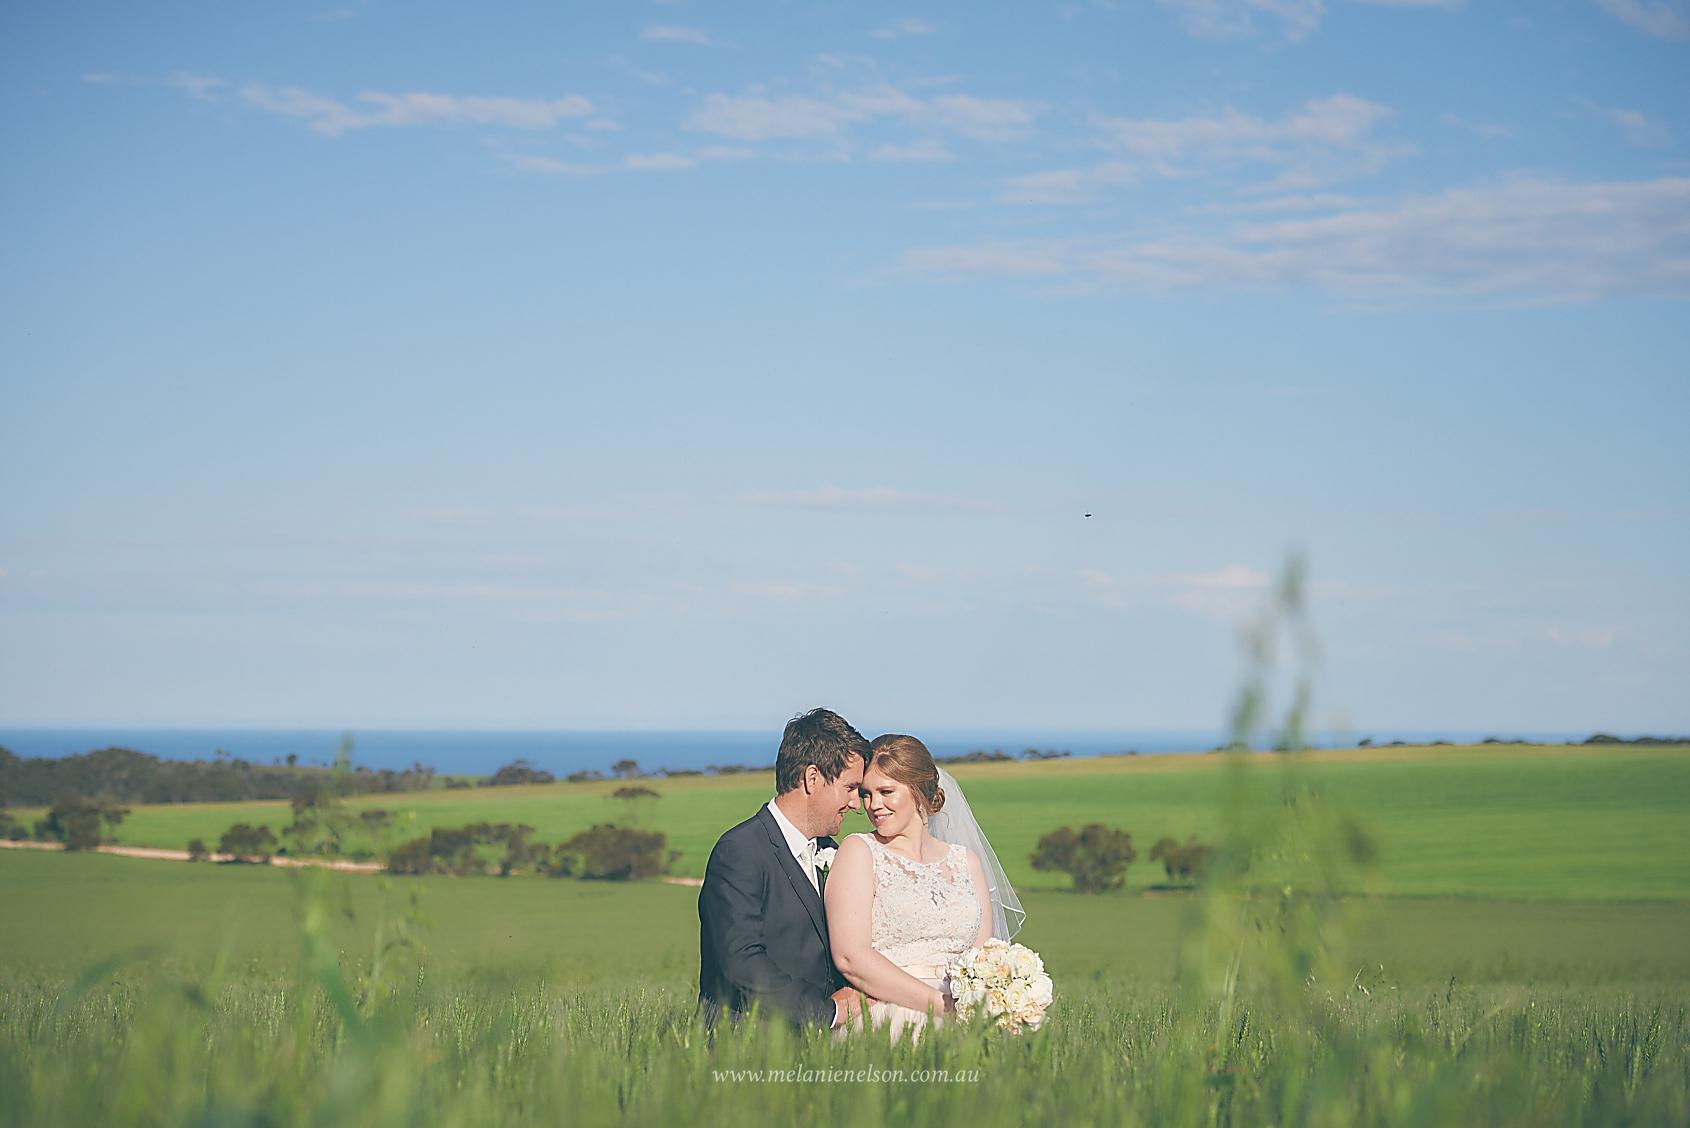 yorke_peninsula_wedding_photographer_0057.jpg